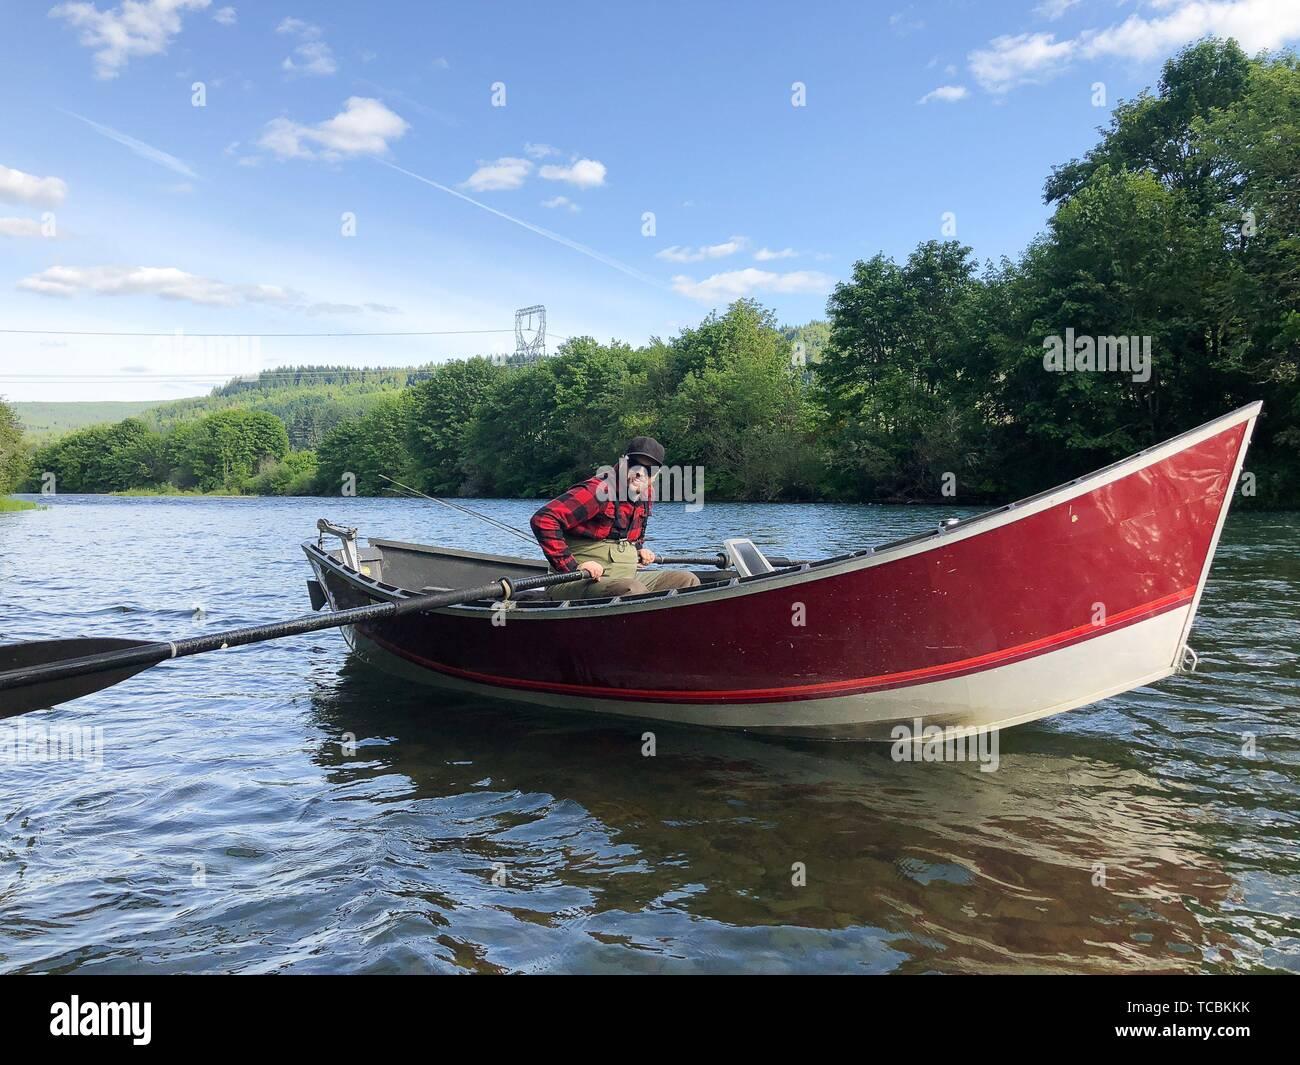 Drift Boat Stock Photos & Drift Boat Stock Images - Alamy